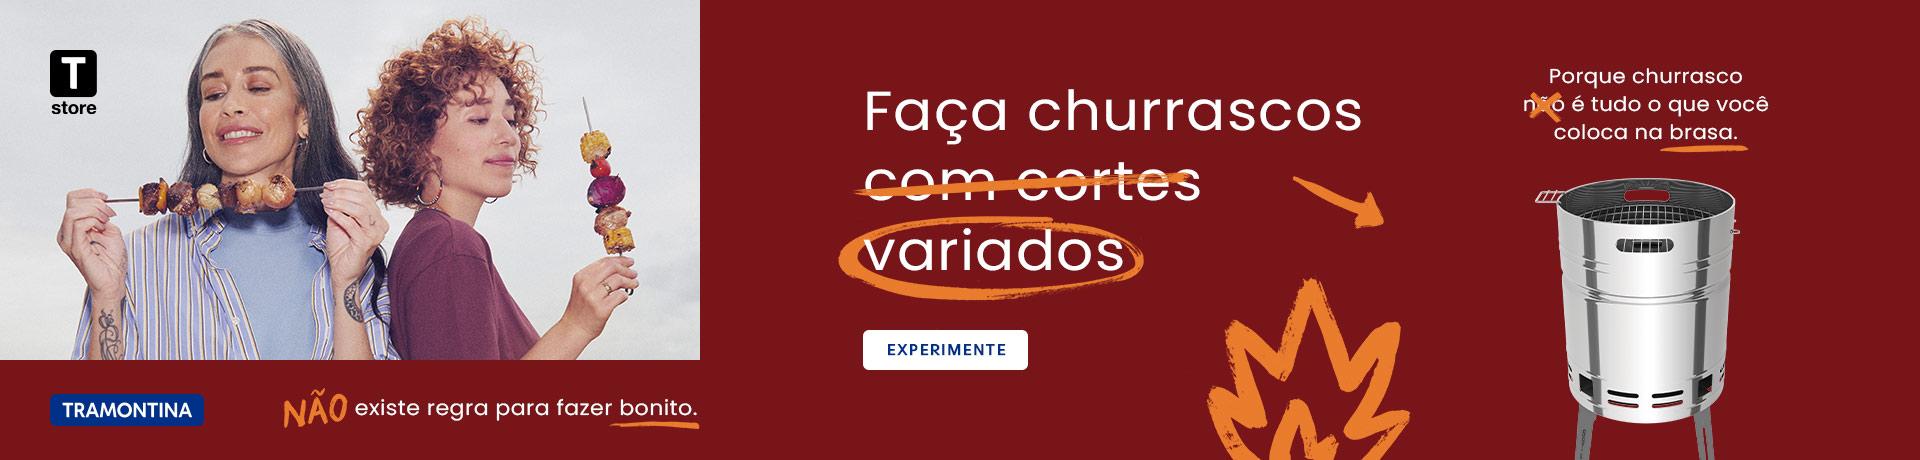 Banner 3 - Churrasco